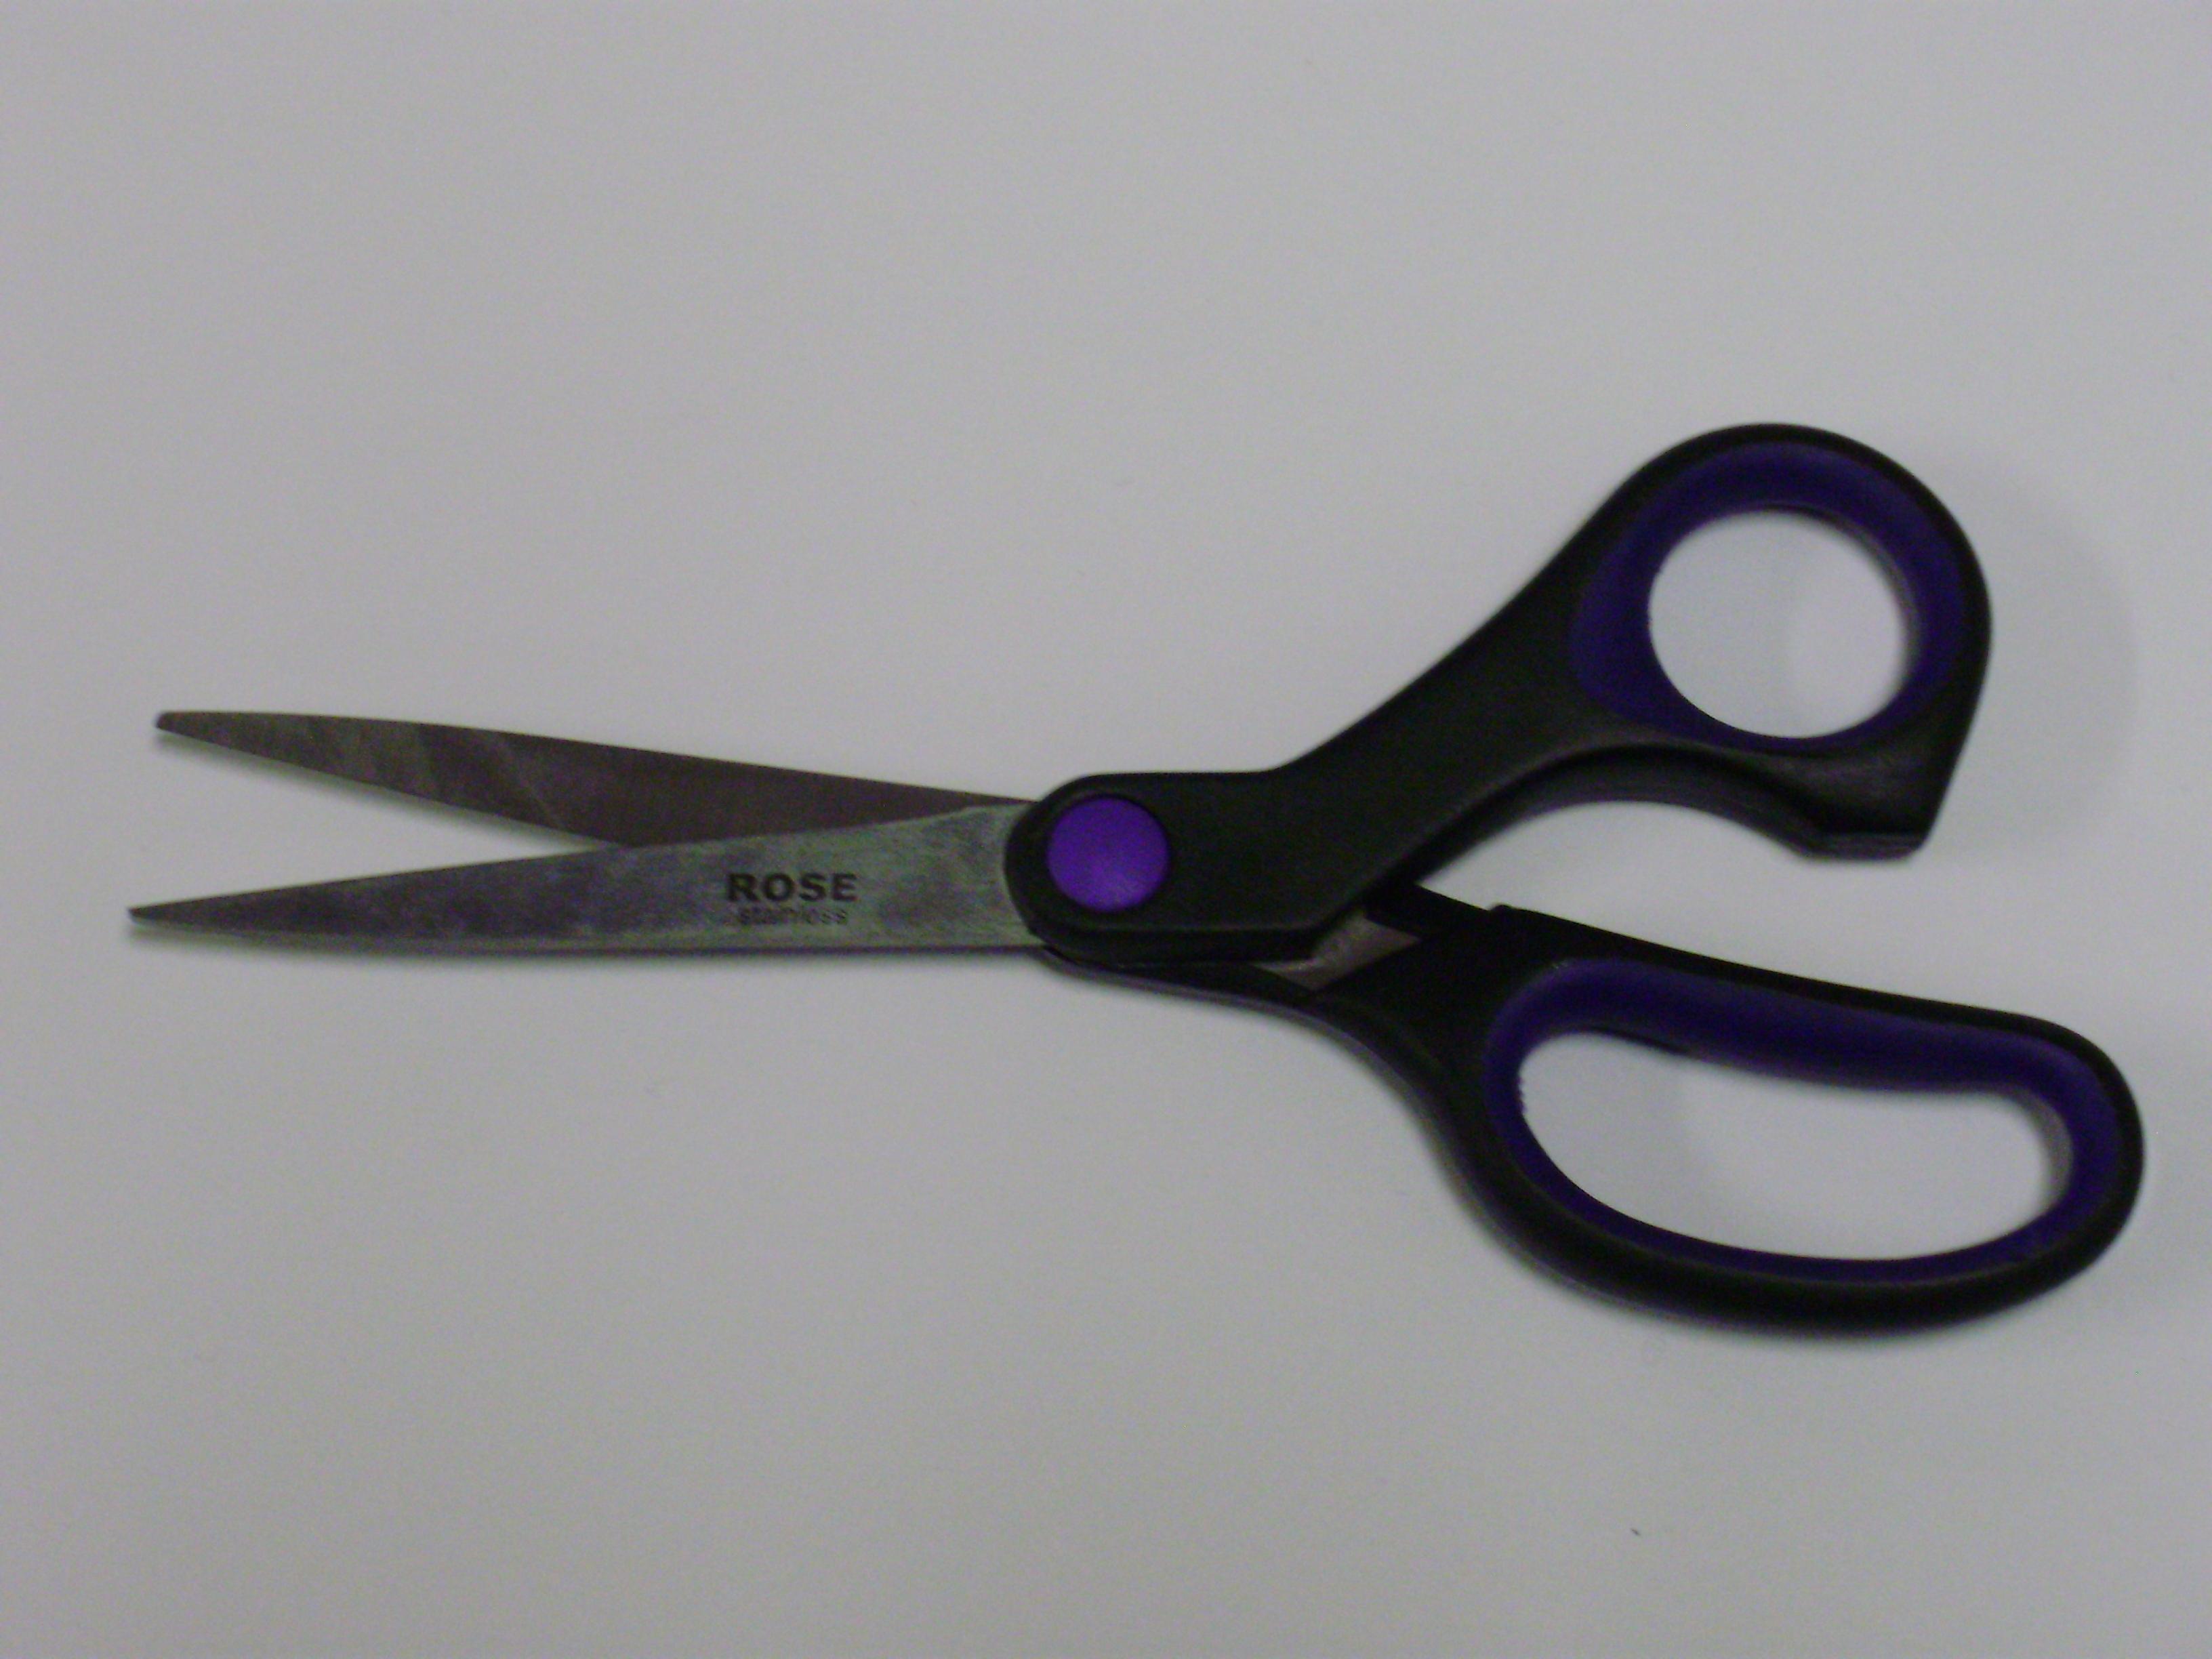 "Scissors School Source Soft Grip 1023 - 6.75"" - Each"